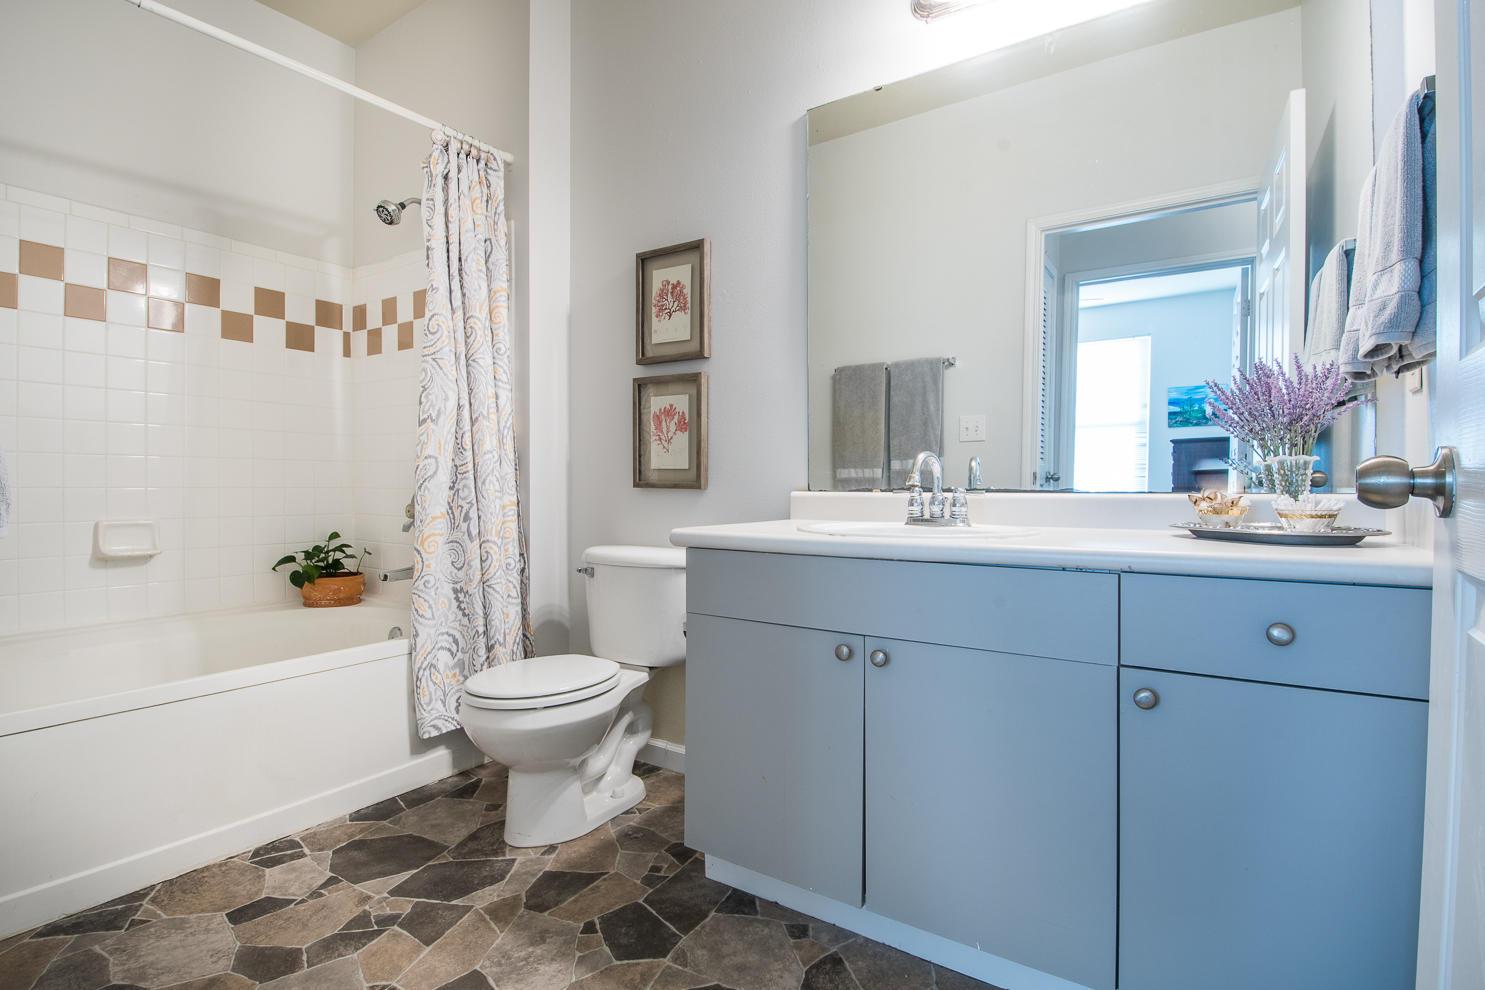 Daniel Landing Condos Homes For Sale - 130 River Landing, Charleston, SC - 25